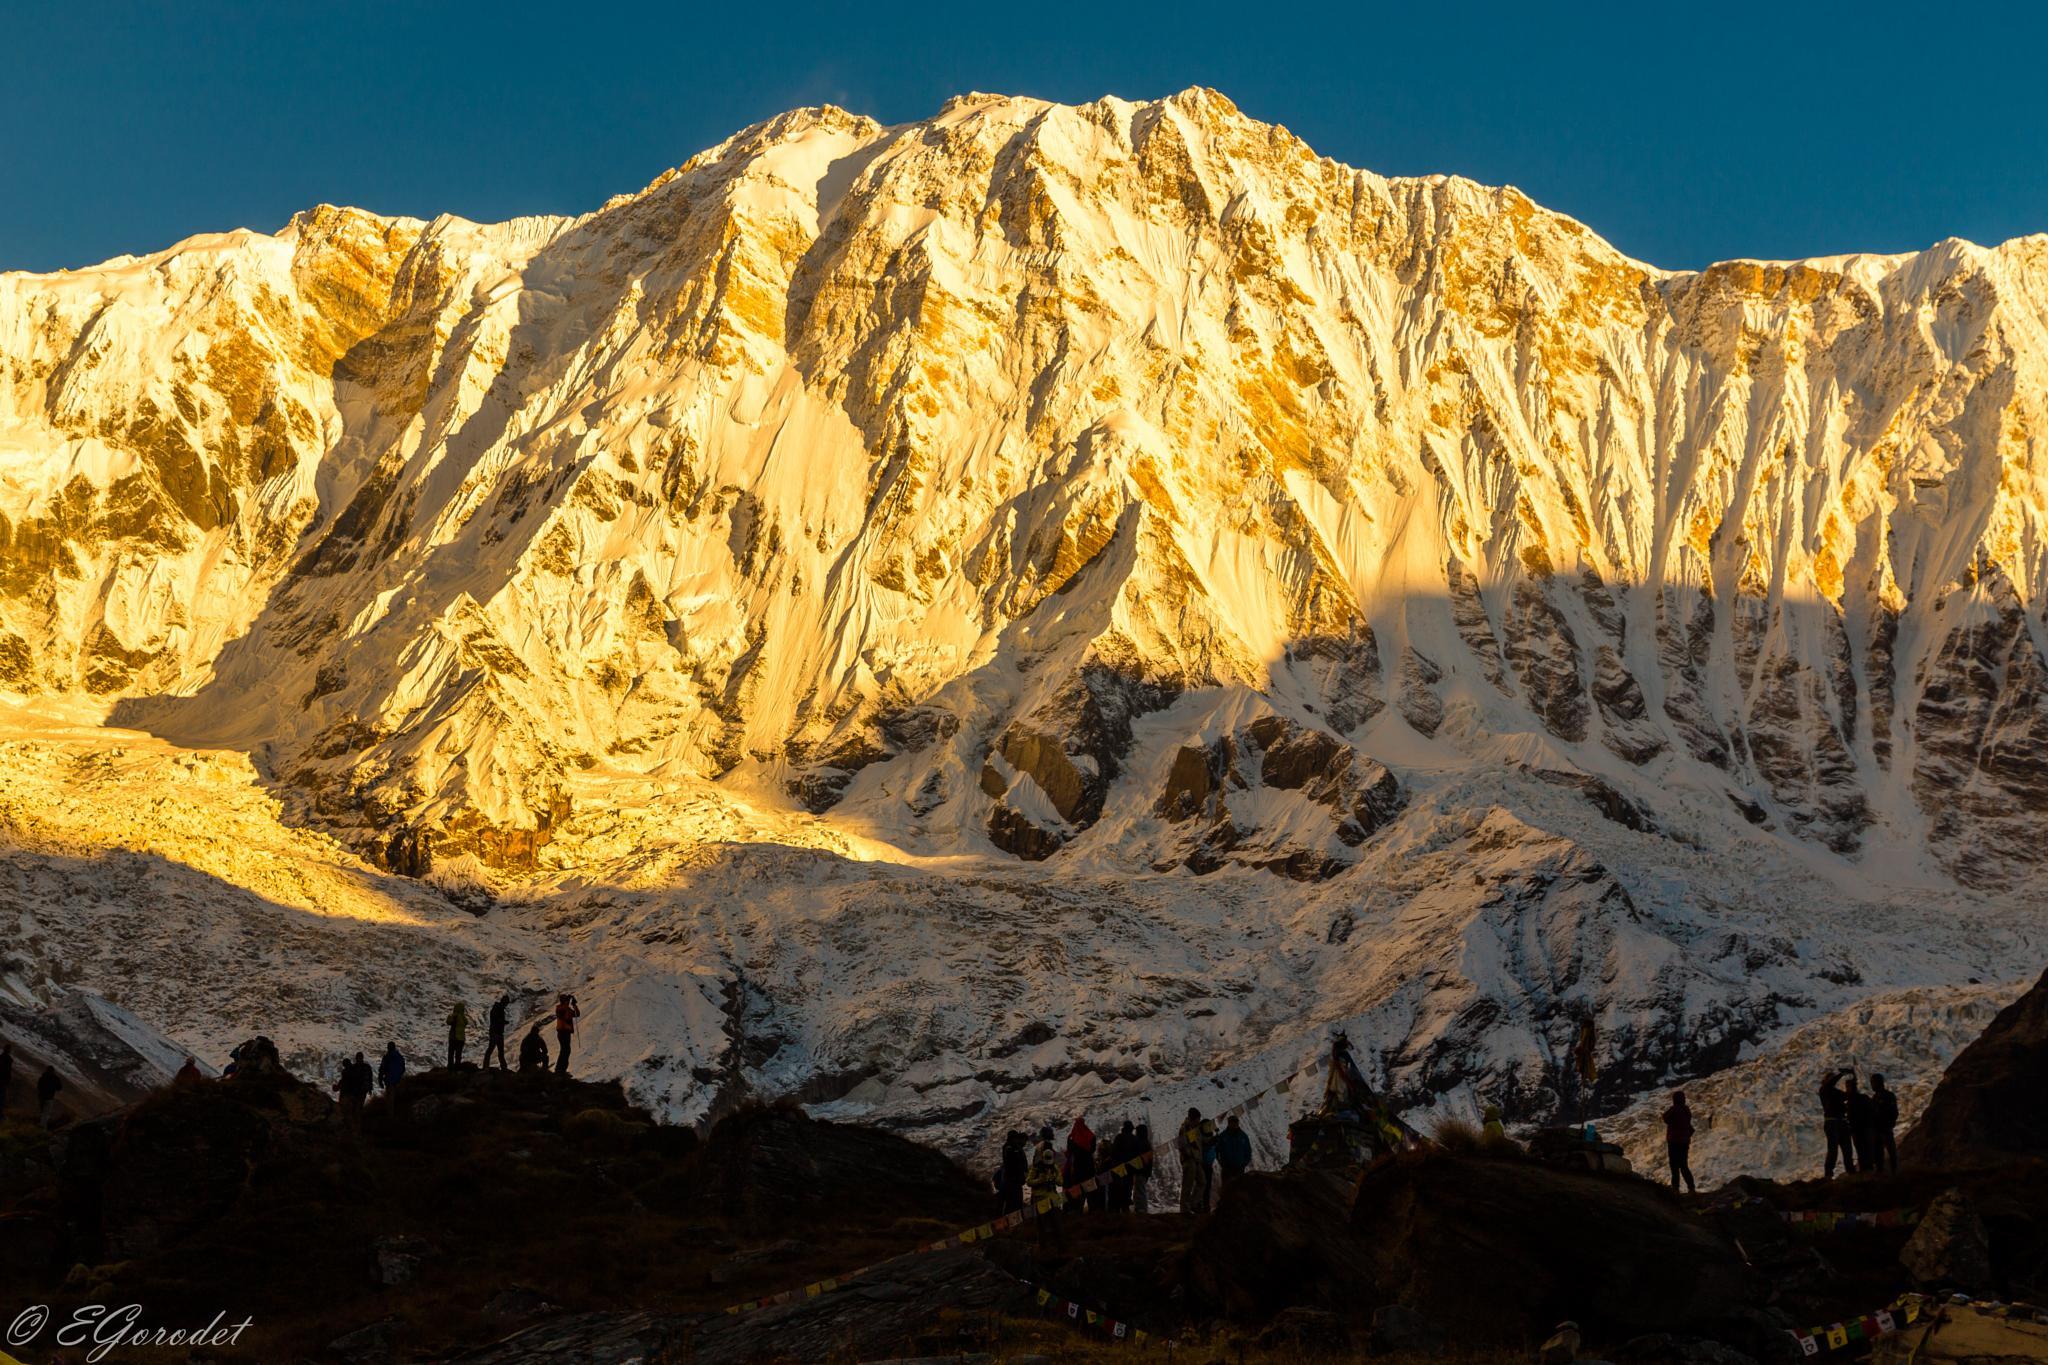 Metting sunrise at the Annapurna Sanctuary by Evgeny Gorodetsky